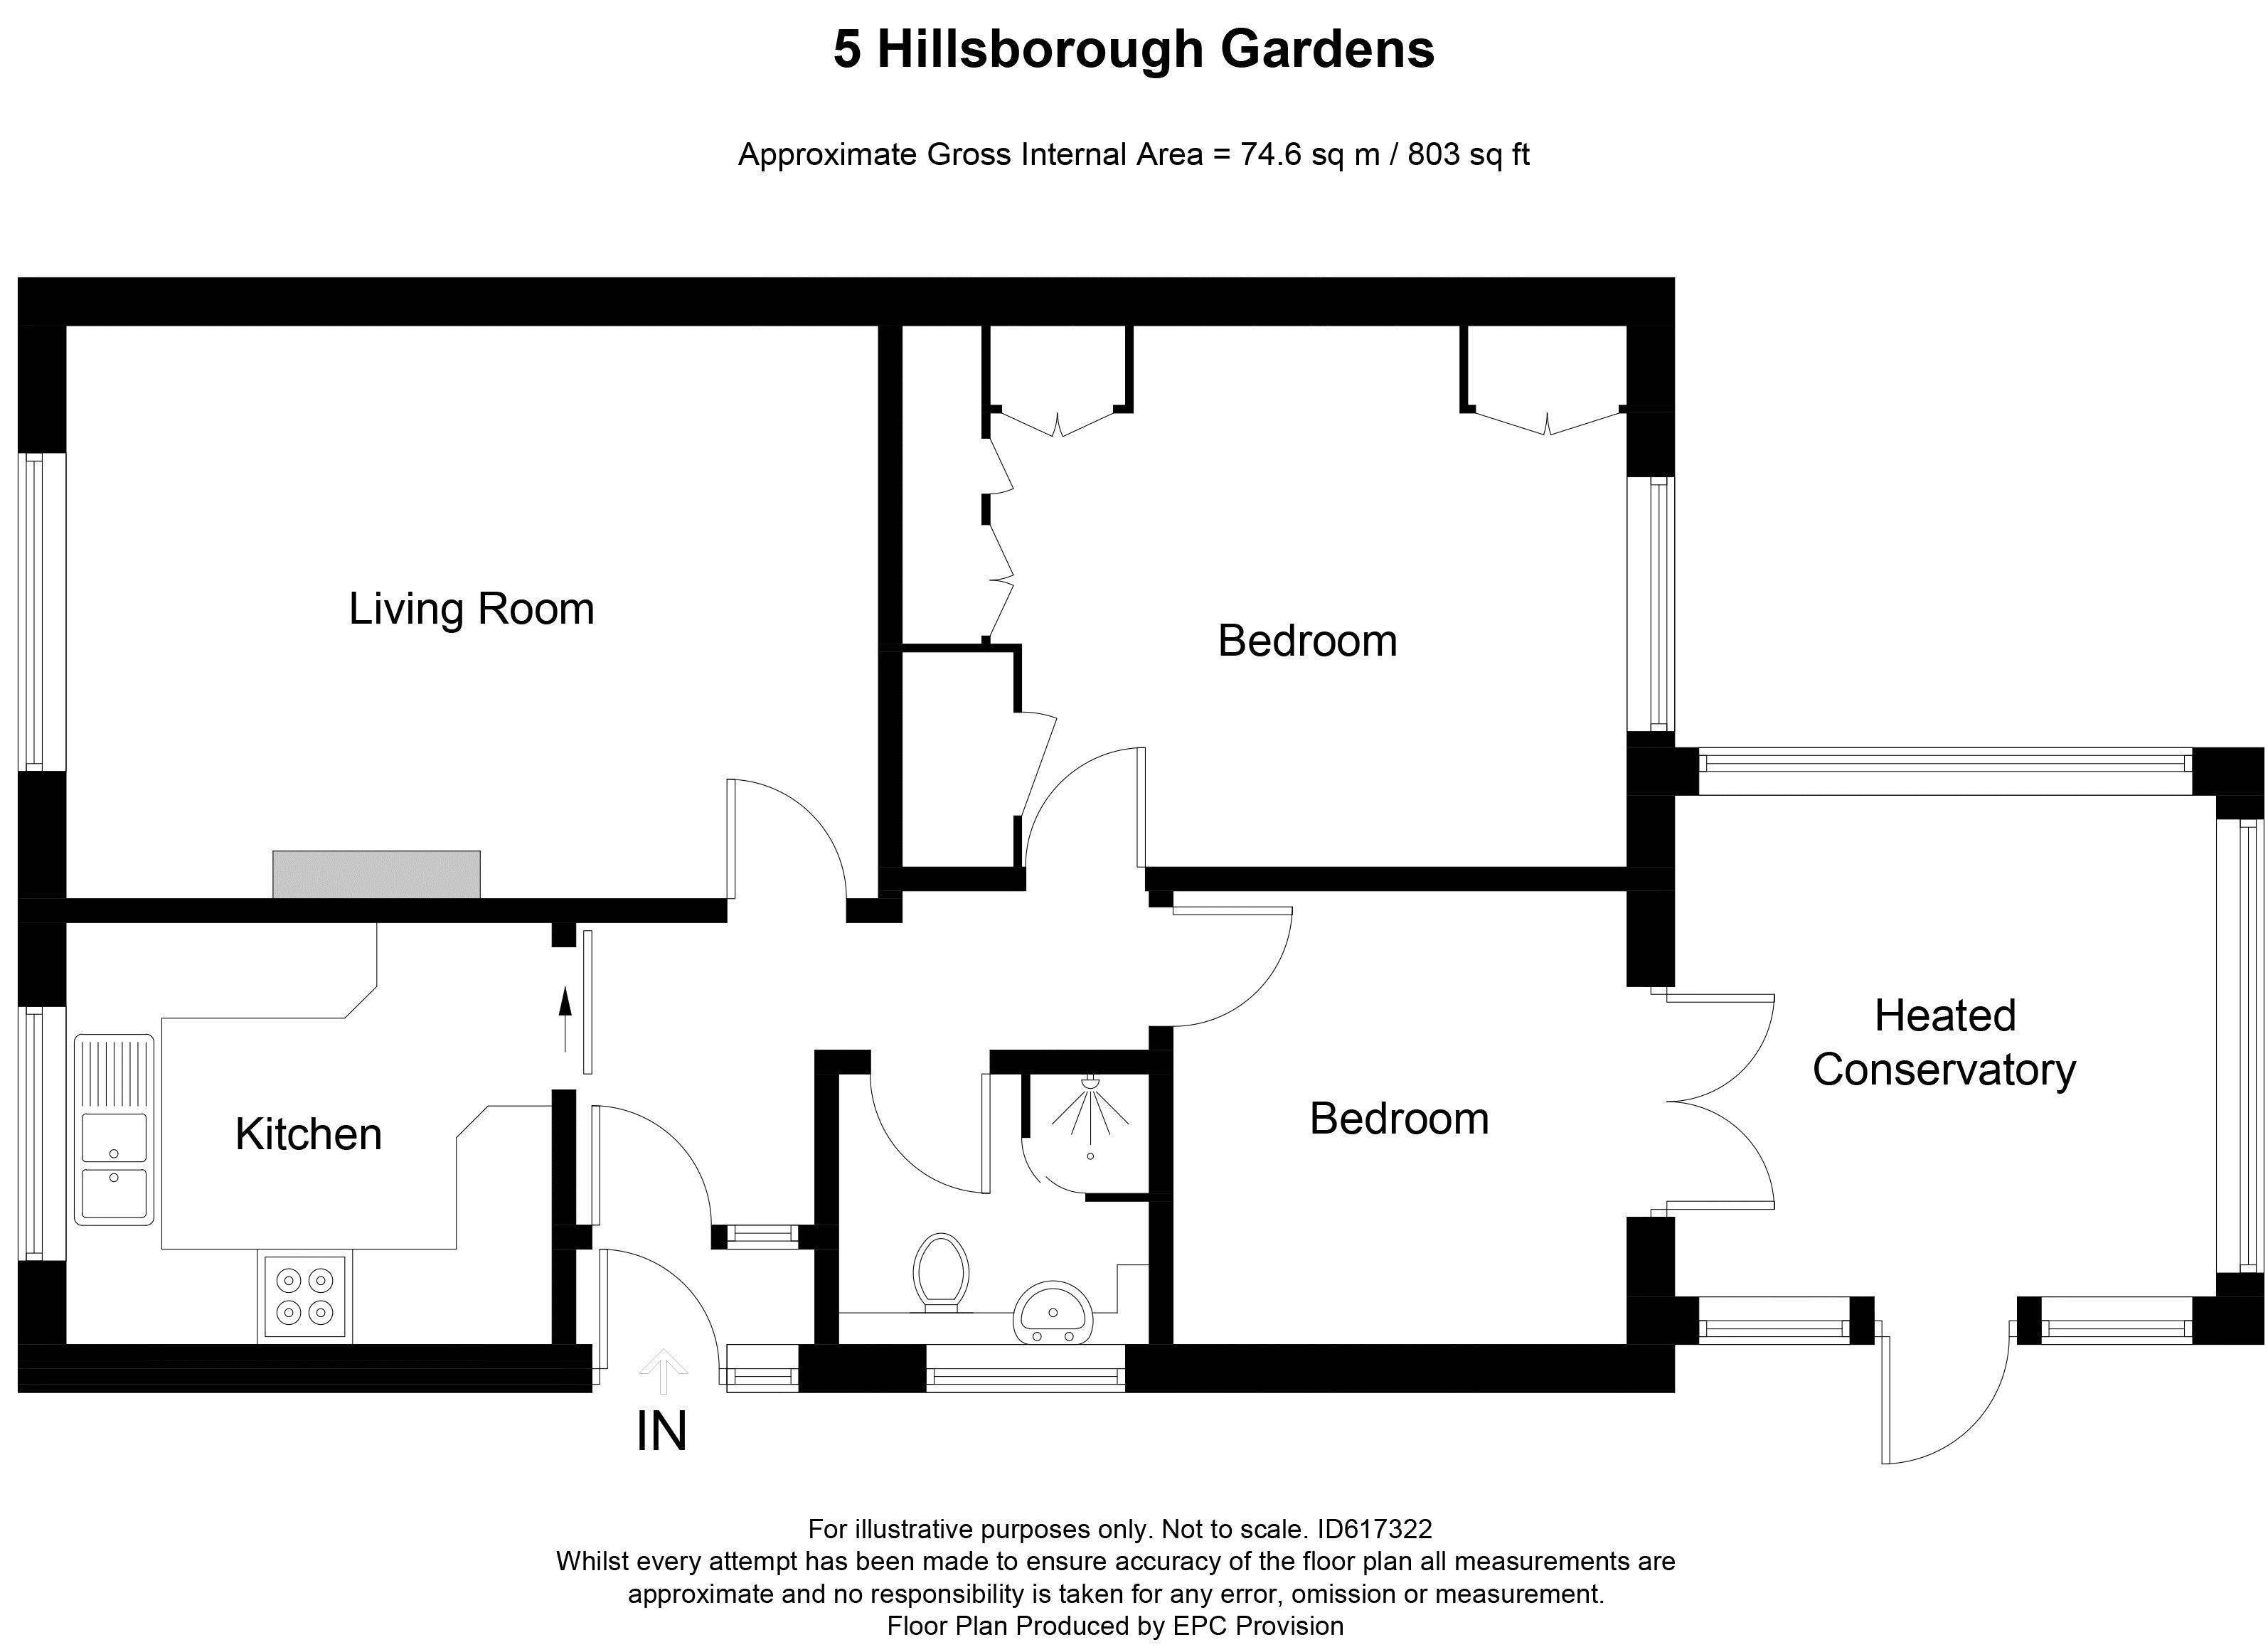 Hillsborough Gardens